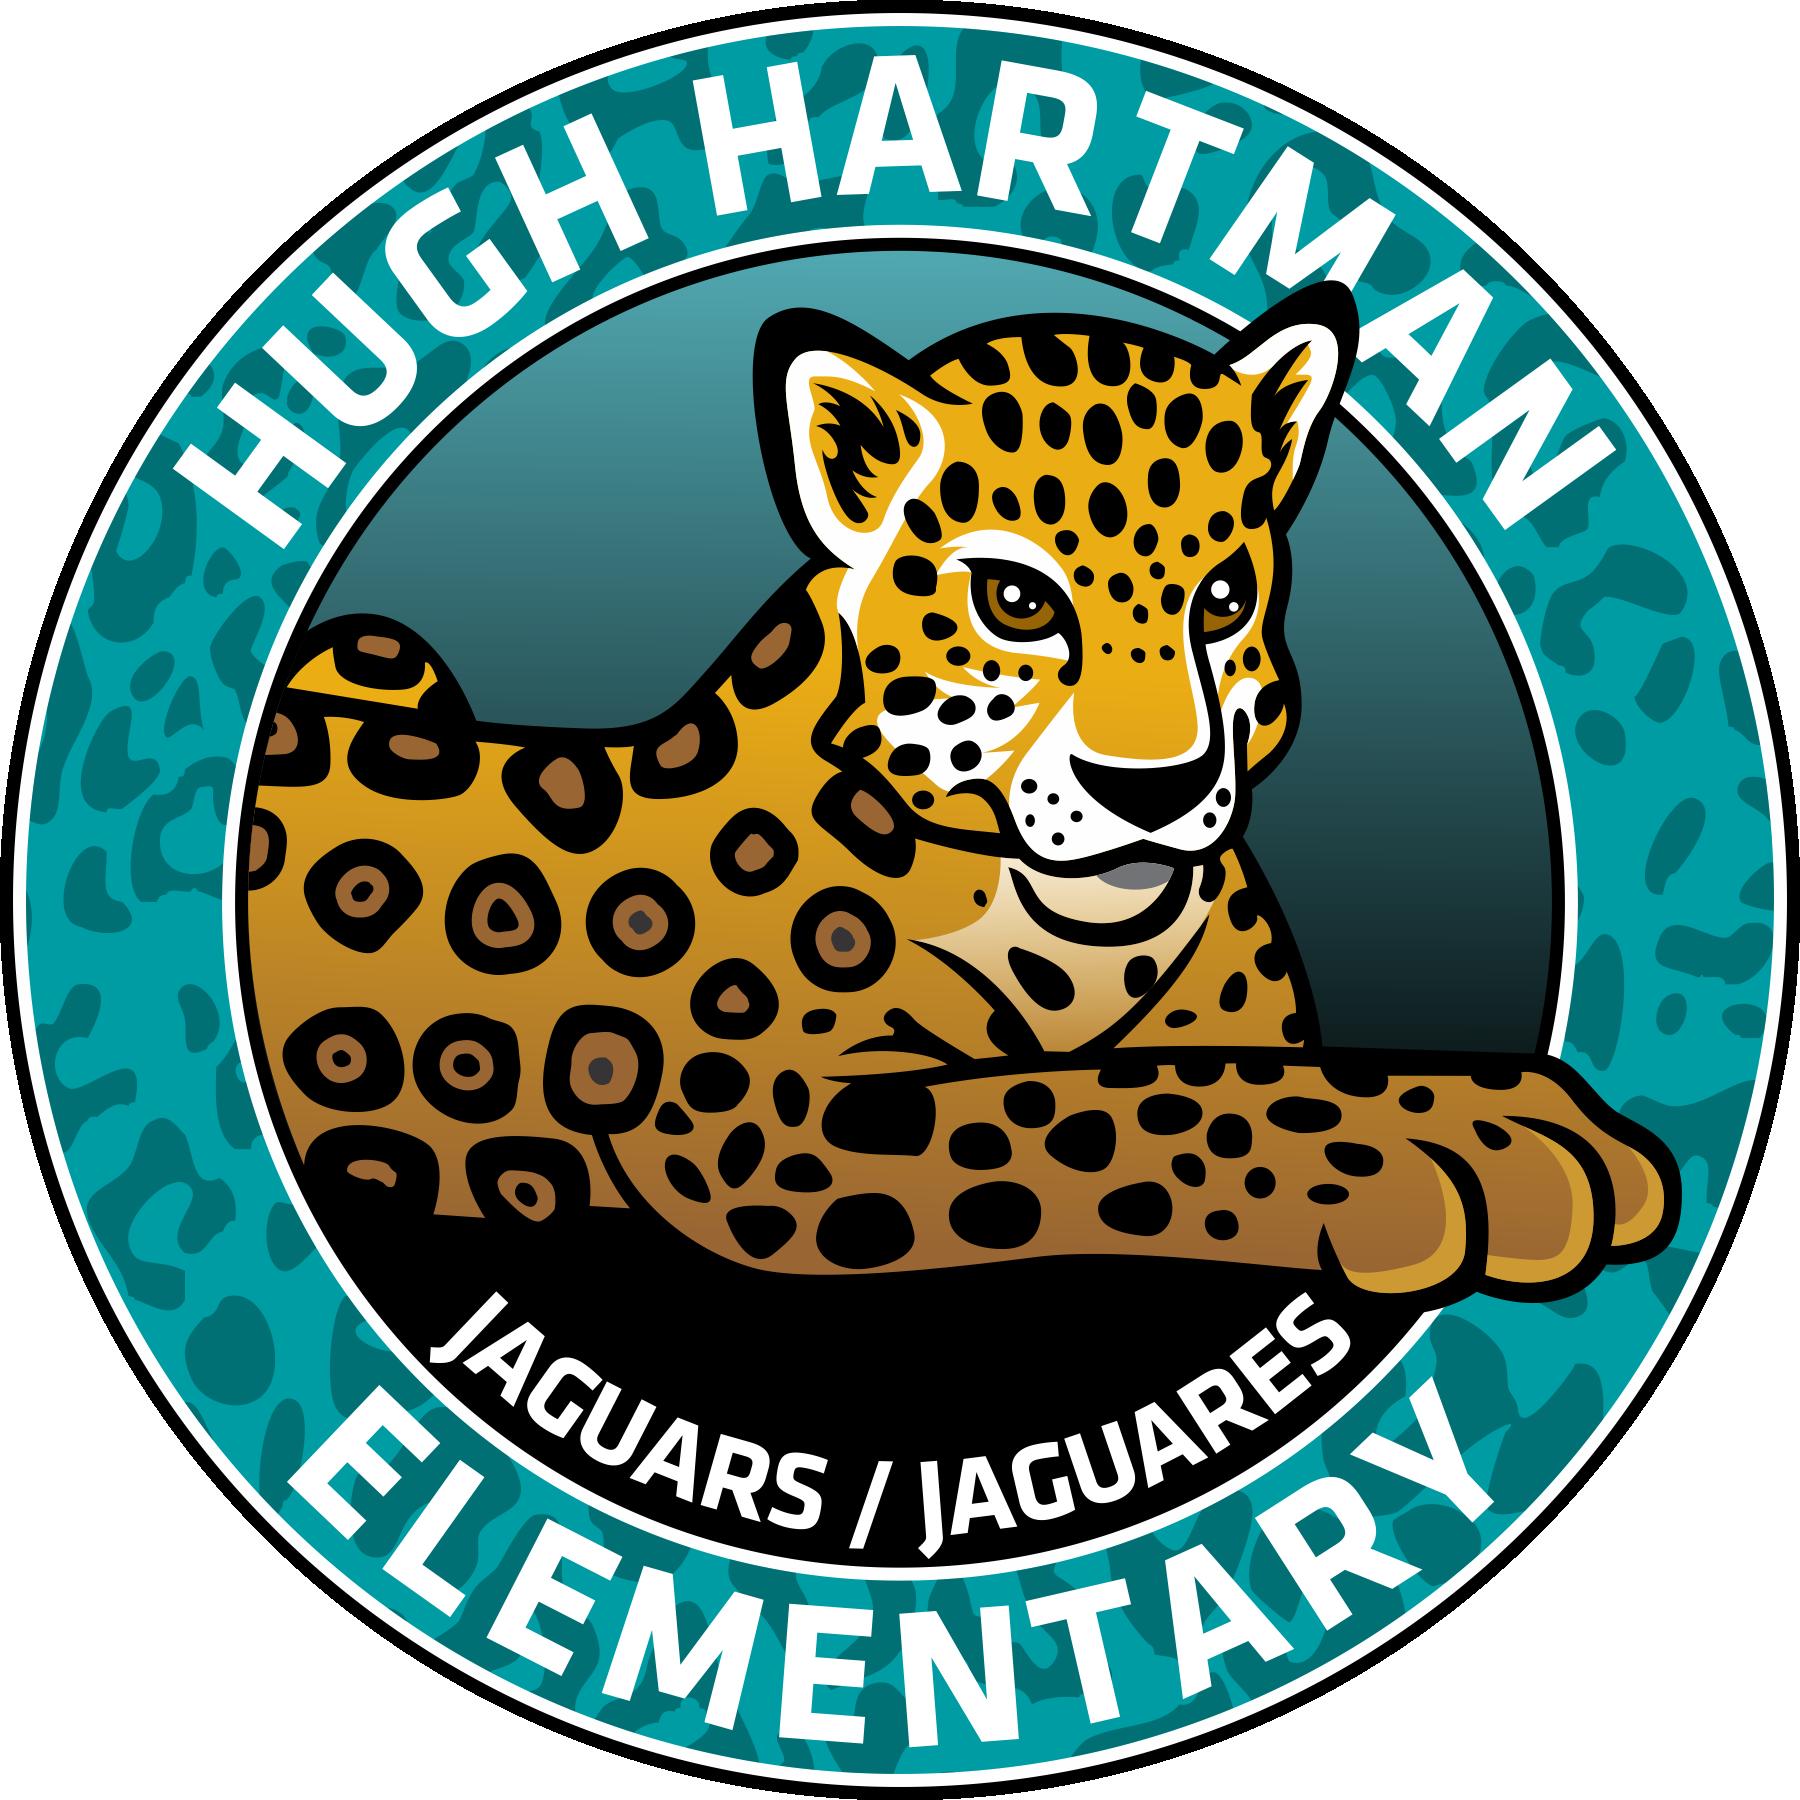 Hugh Hartman Elementary School